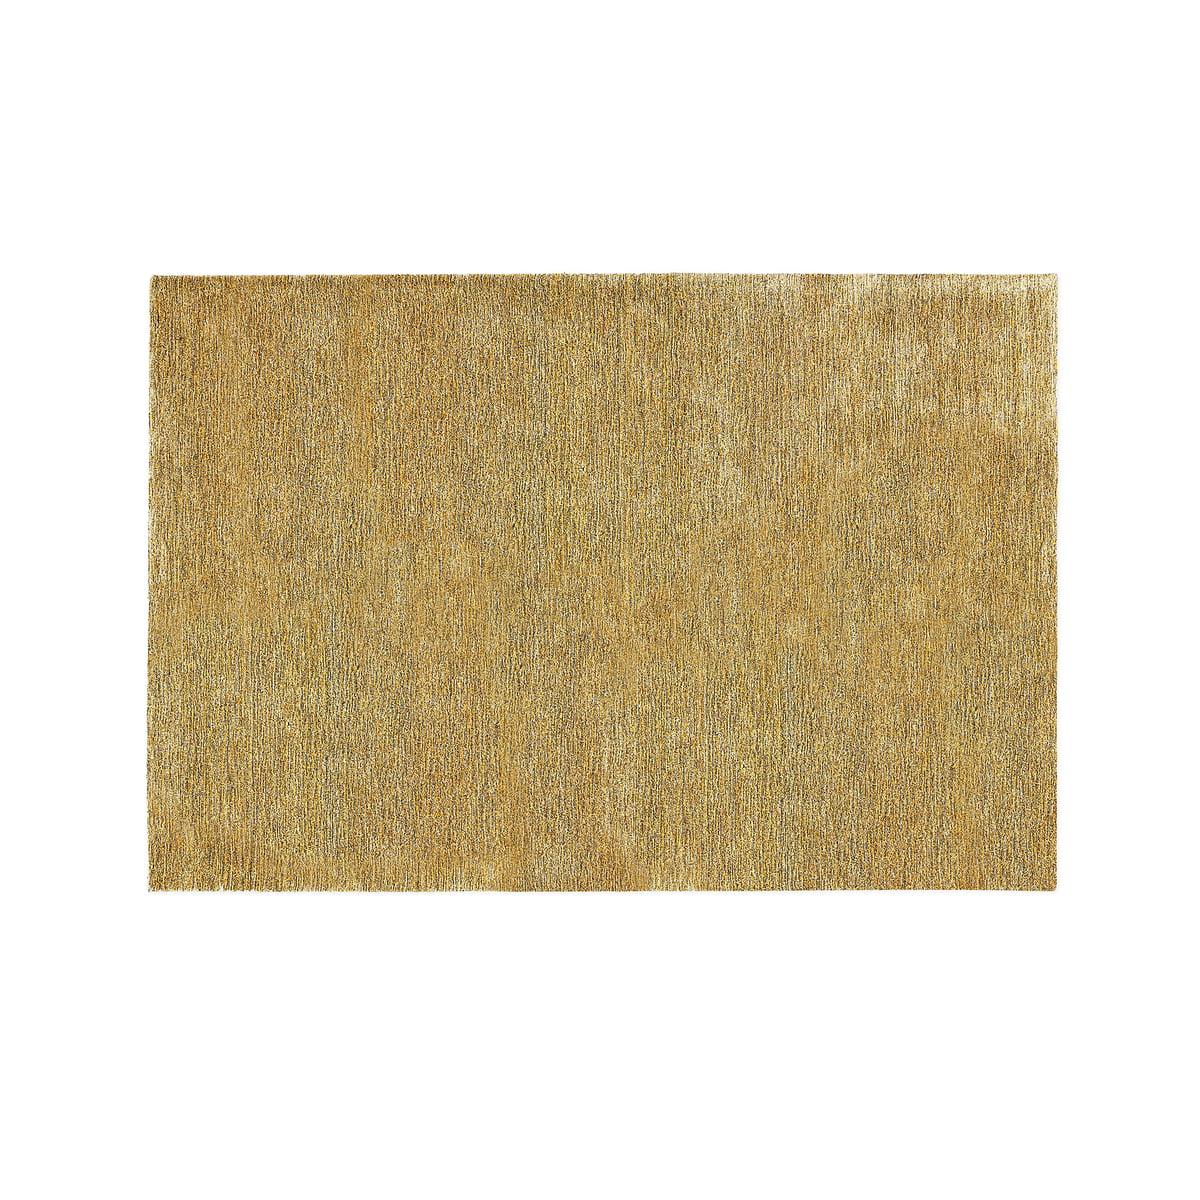 confetti teppich von normann copenhagen. Black Bedroom Furniture Sets. Home Design Ideas